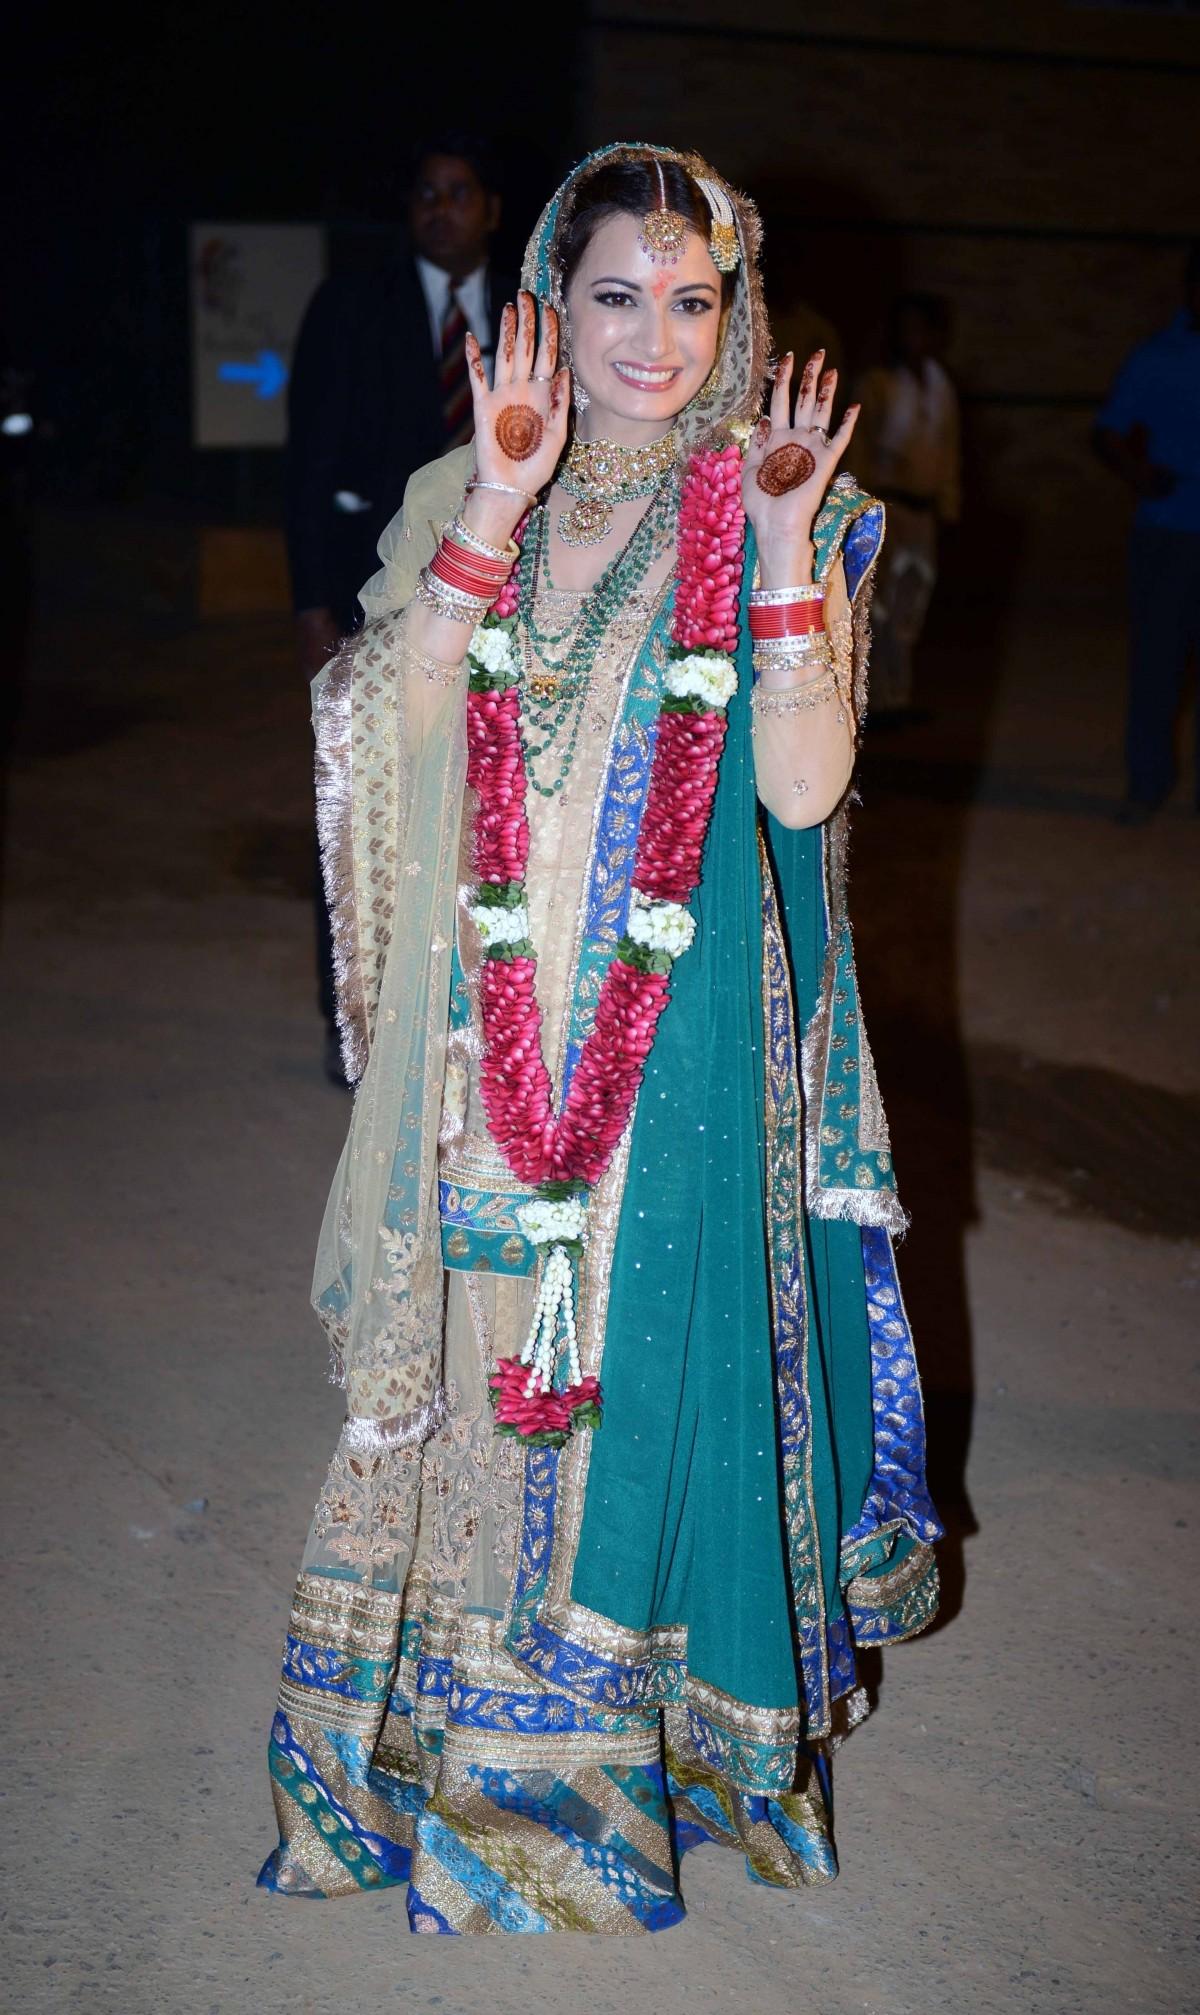 Dia Mirza Weds Long-Time Beau Sahil Sangha, Looks Splendid in Ritu Kumar Lehenga